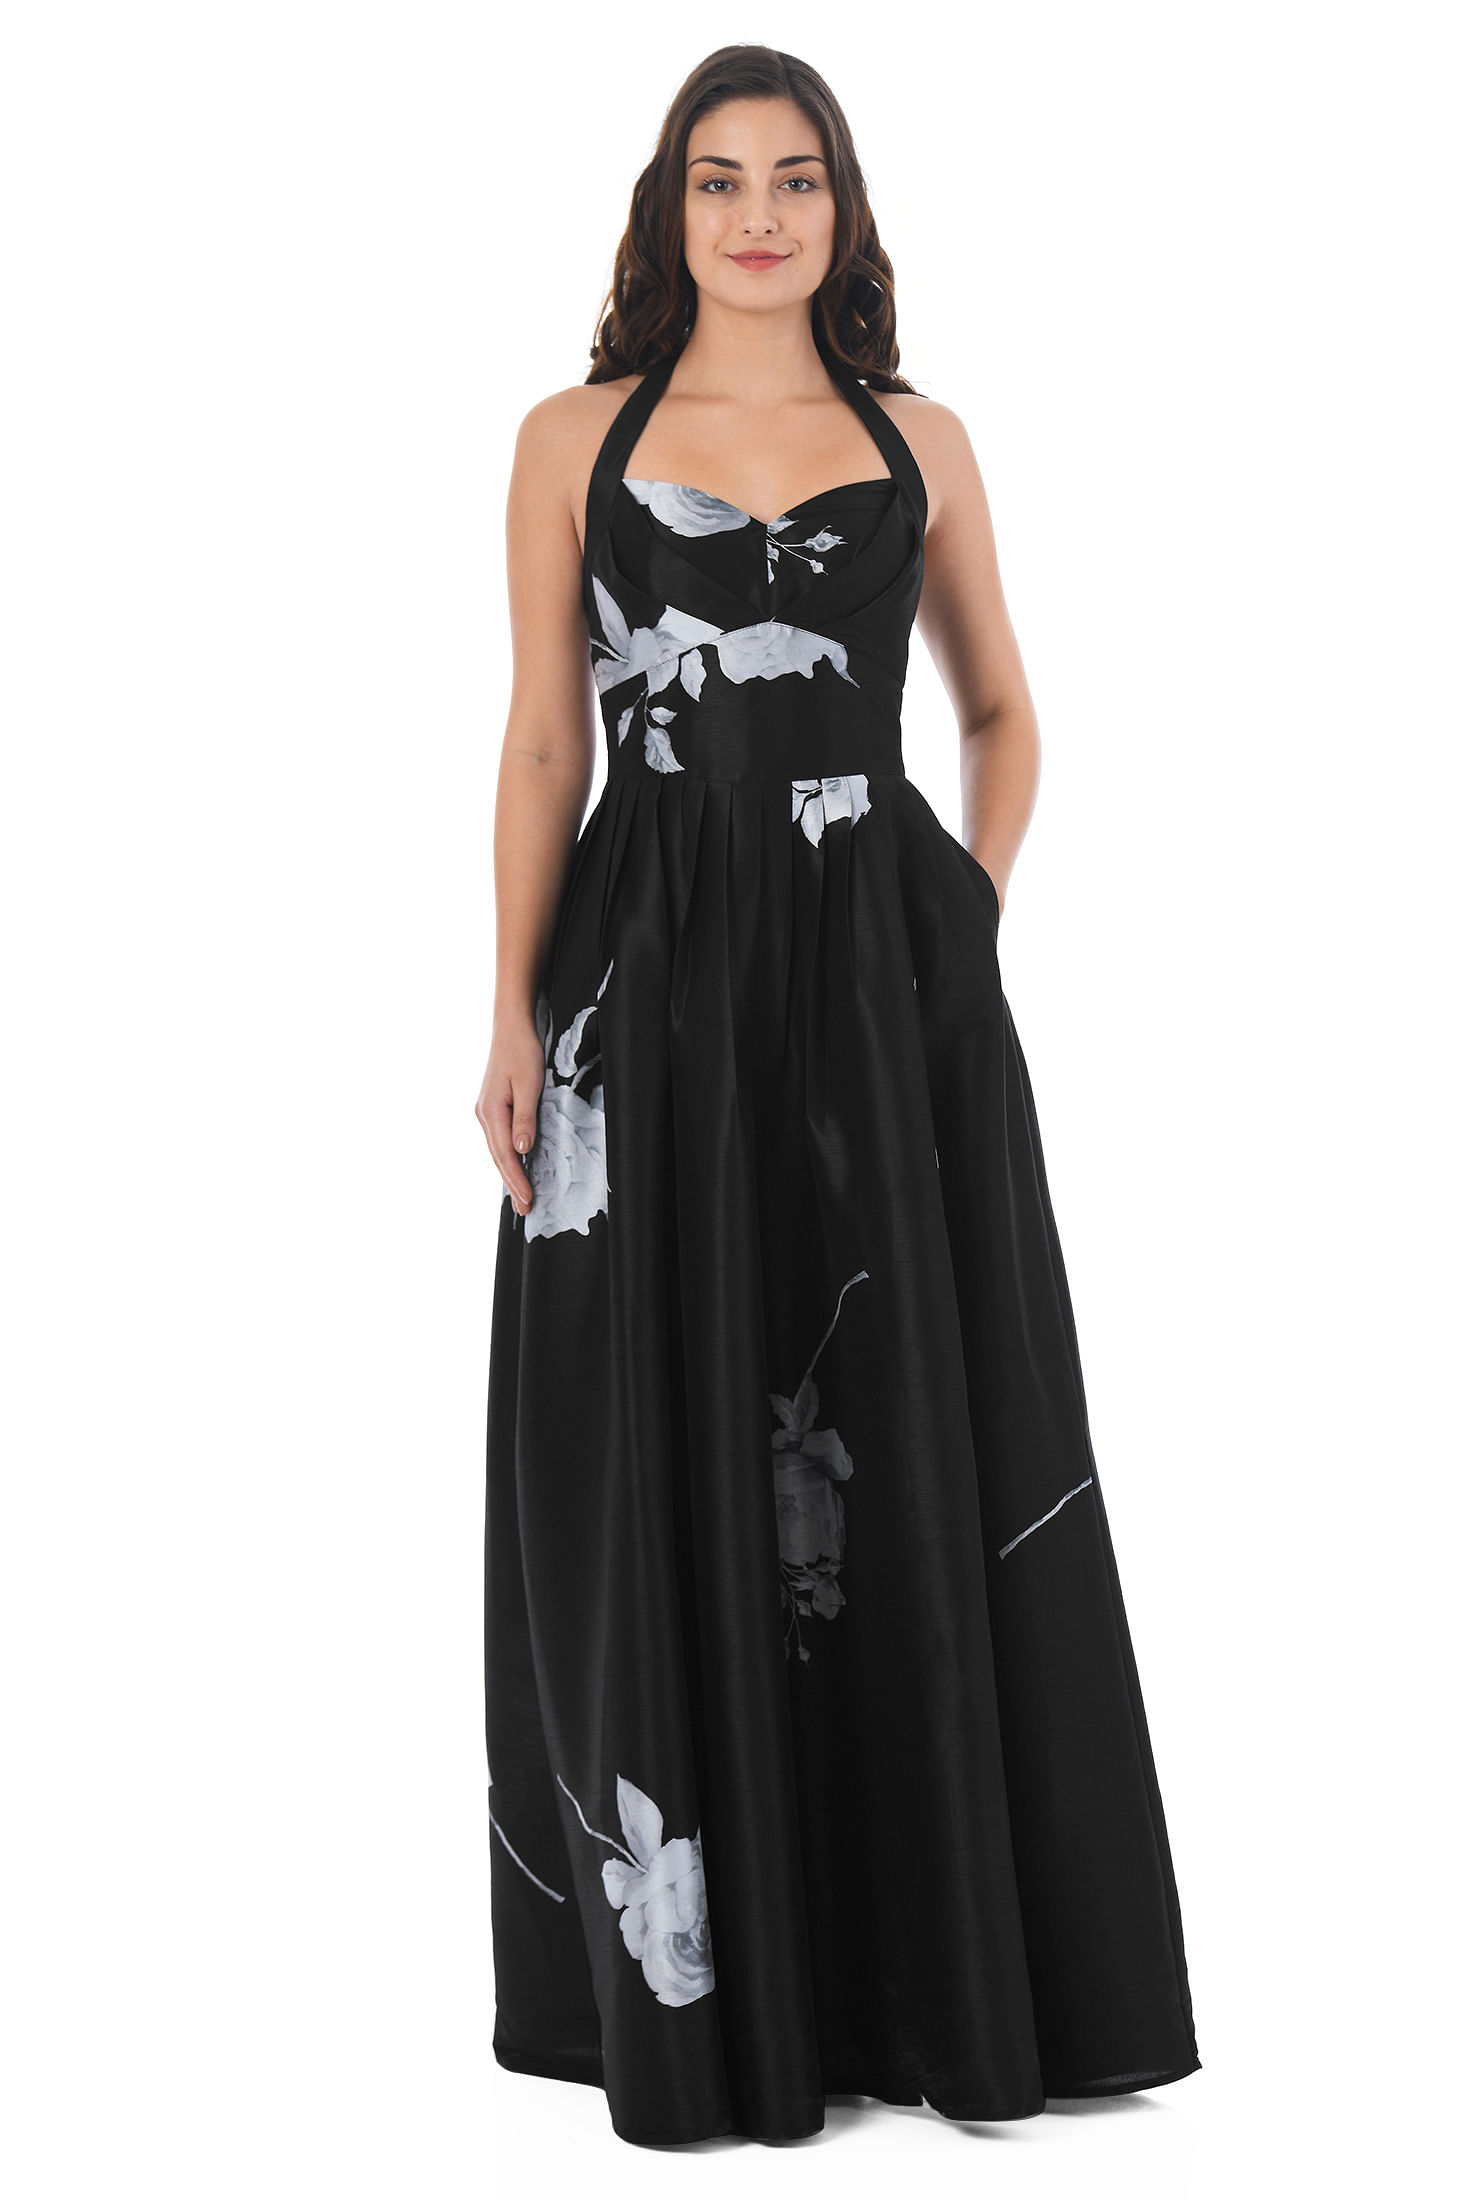 Womens fashion clothing 0 36w and custom bridesmaid dresses brooklyn dresses dry clean dresses elastic smocked dresses empire ombrellifo Choice Image